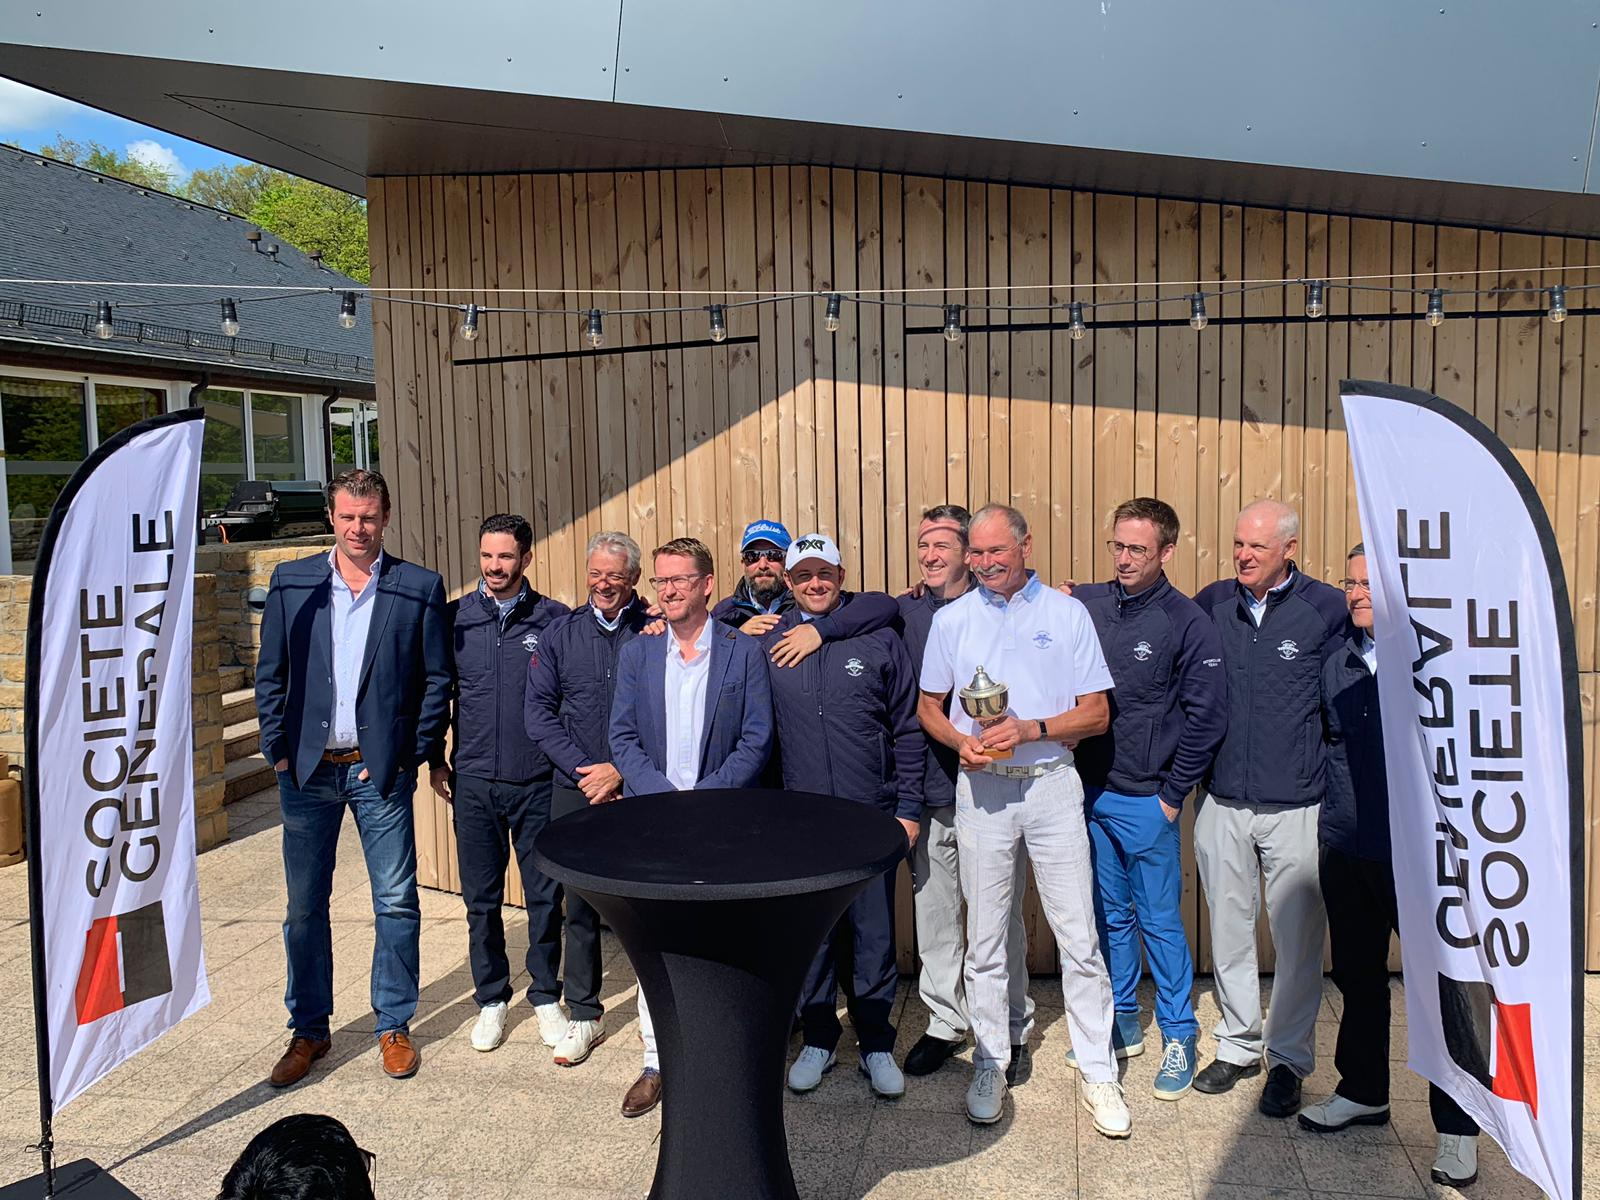 FLG -CHAMPIONNAT INTERCLUBS 2019 - HOMMES: RESULTATS